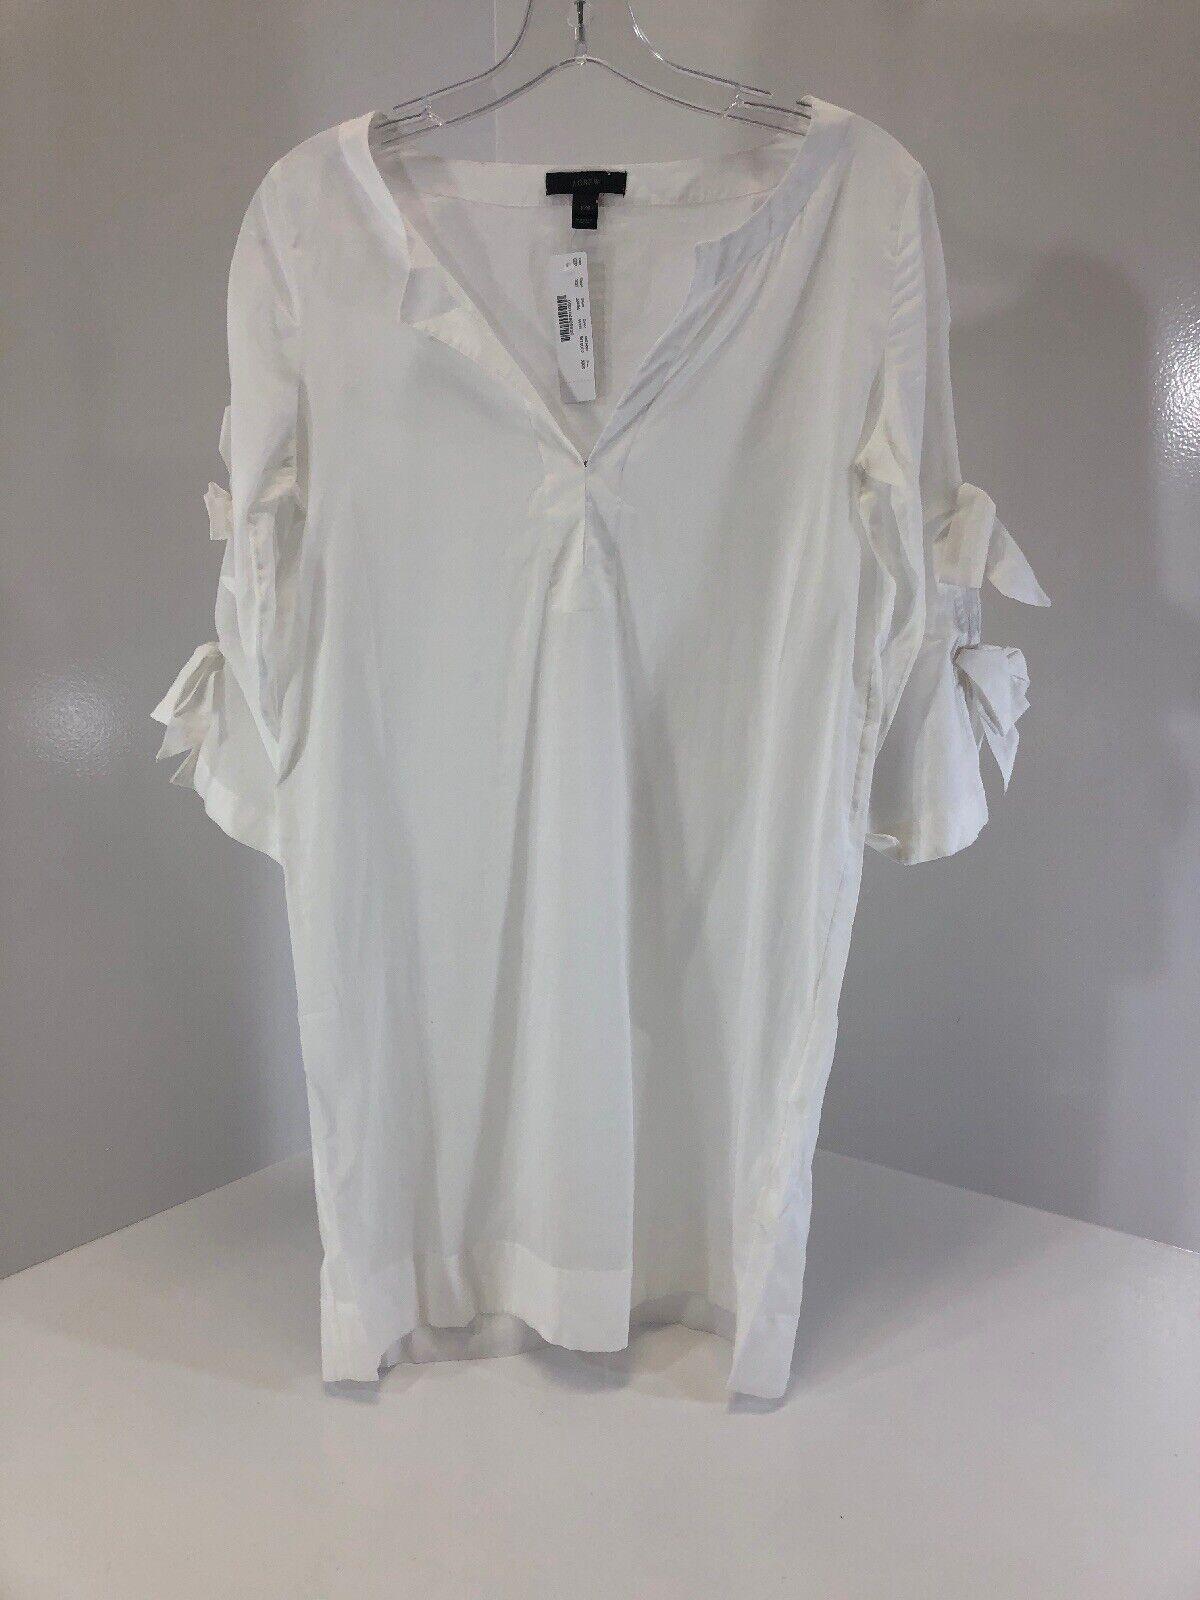 af9e05b5c24 J Crew Womens Carlotta Tie Sleeve Dress XXS color White NWT Size ...